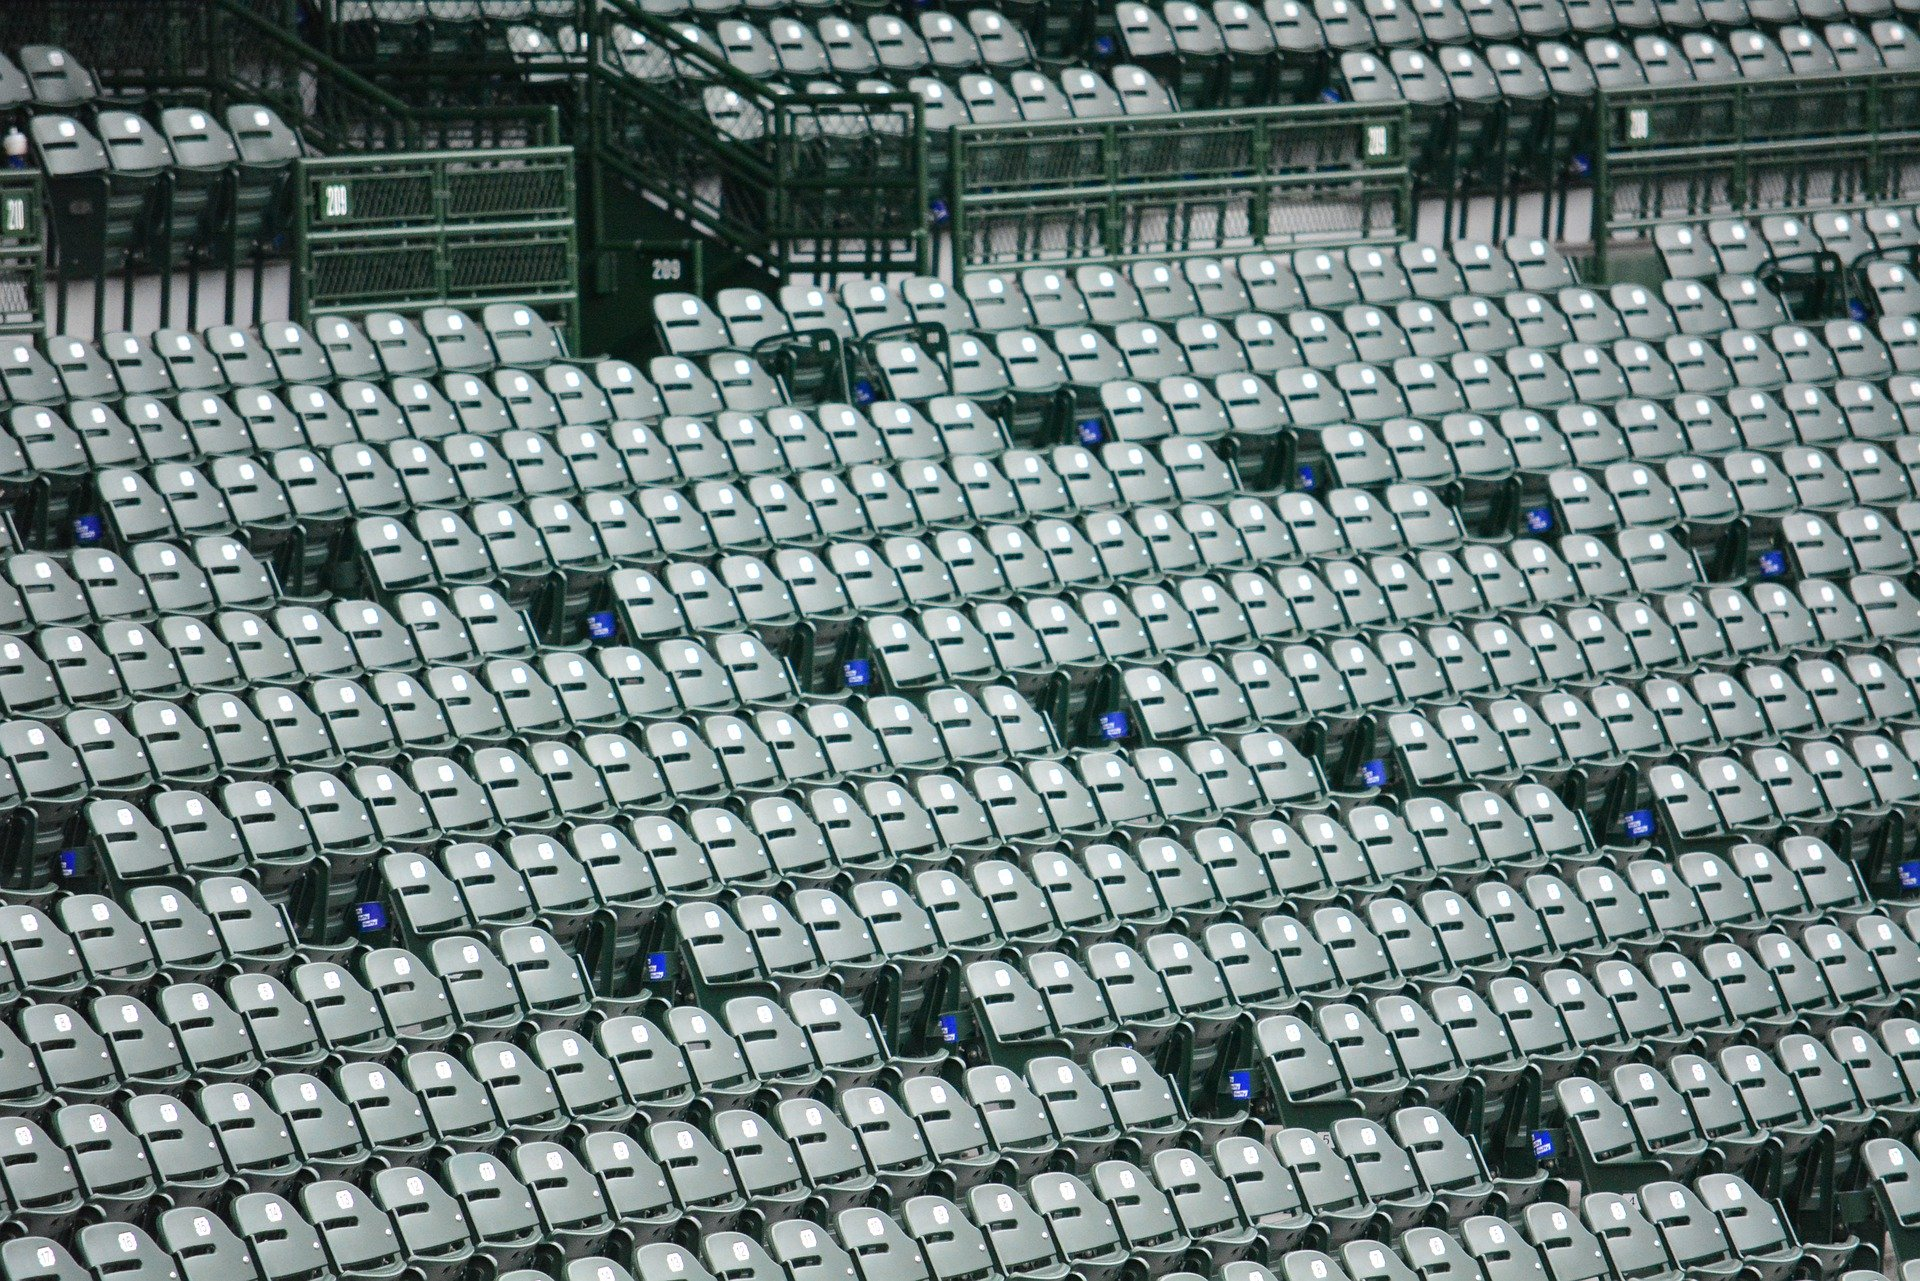 wrigley wrigleyville wrigley field chicago cubs white sox baseball schedule 2020